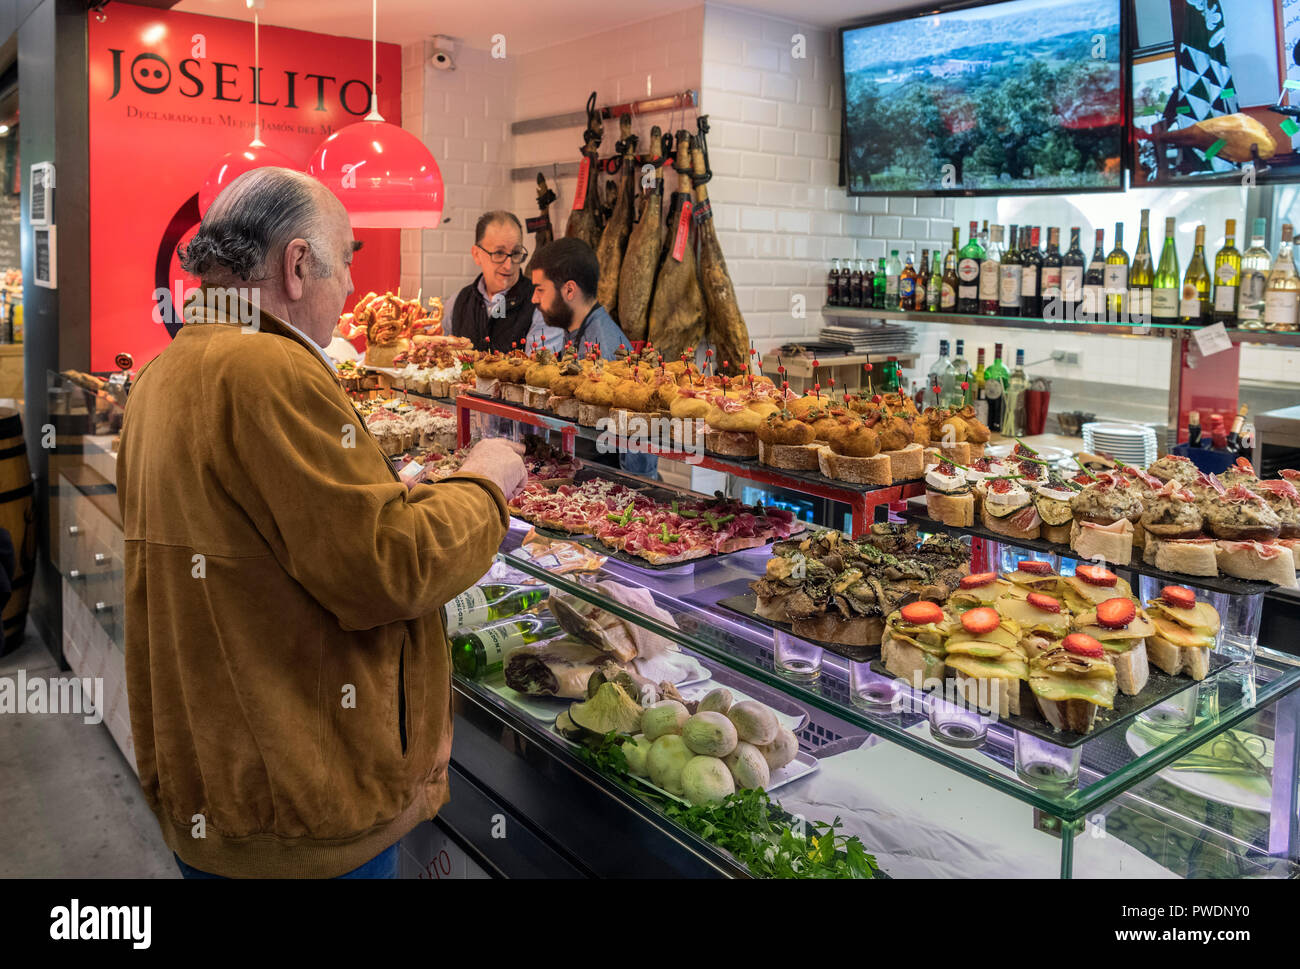 Middle aged man at a food counter in the Mercade de la Ribera, Casco Viejo, Bilbao, Basque Country, Spain - Stock Image